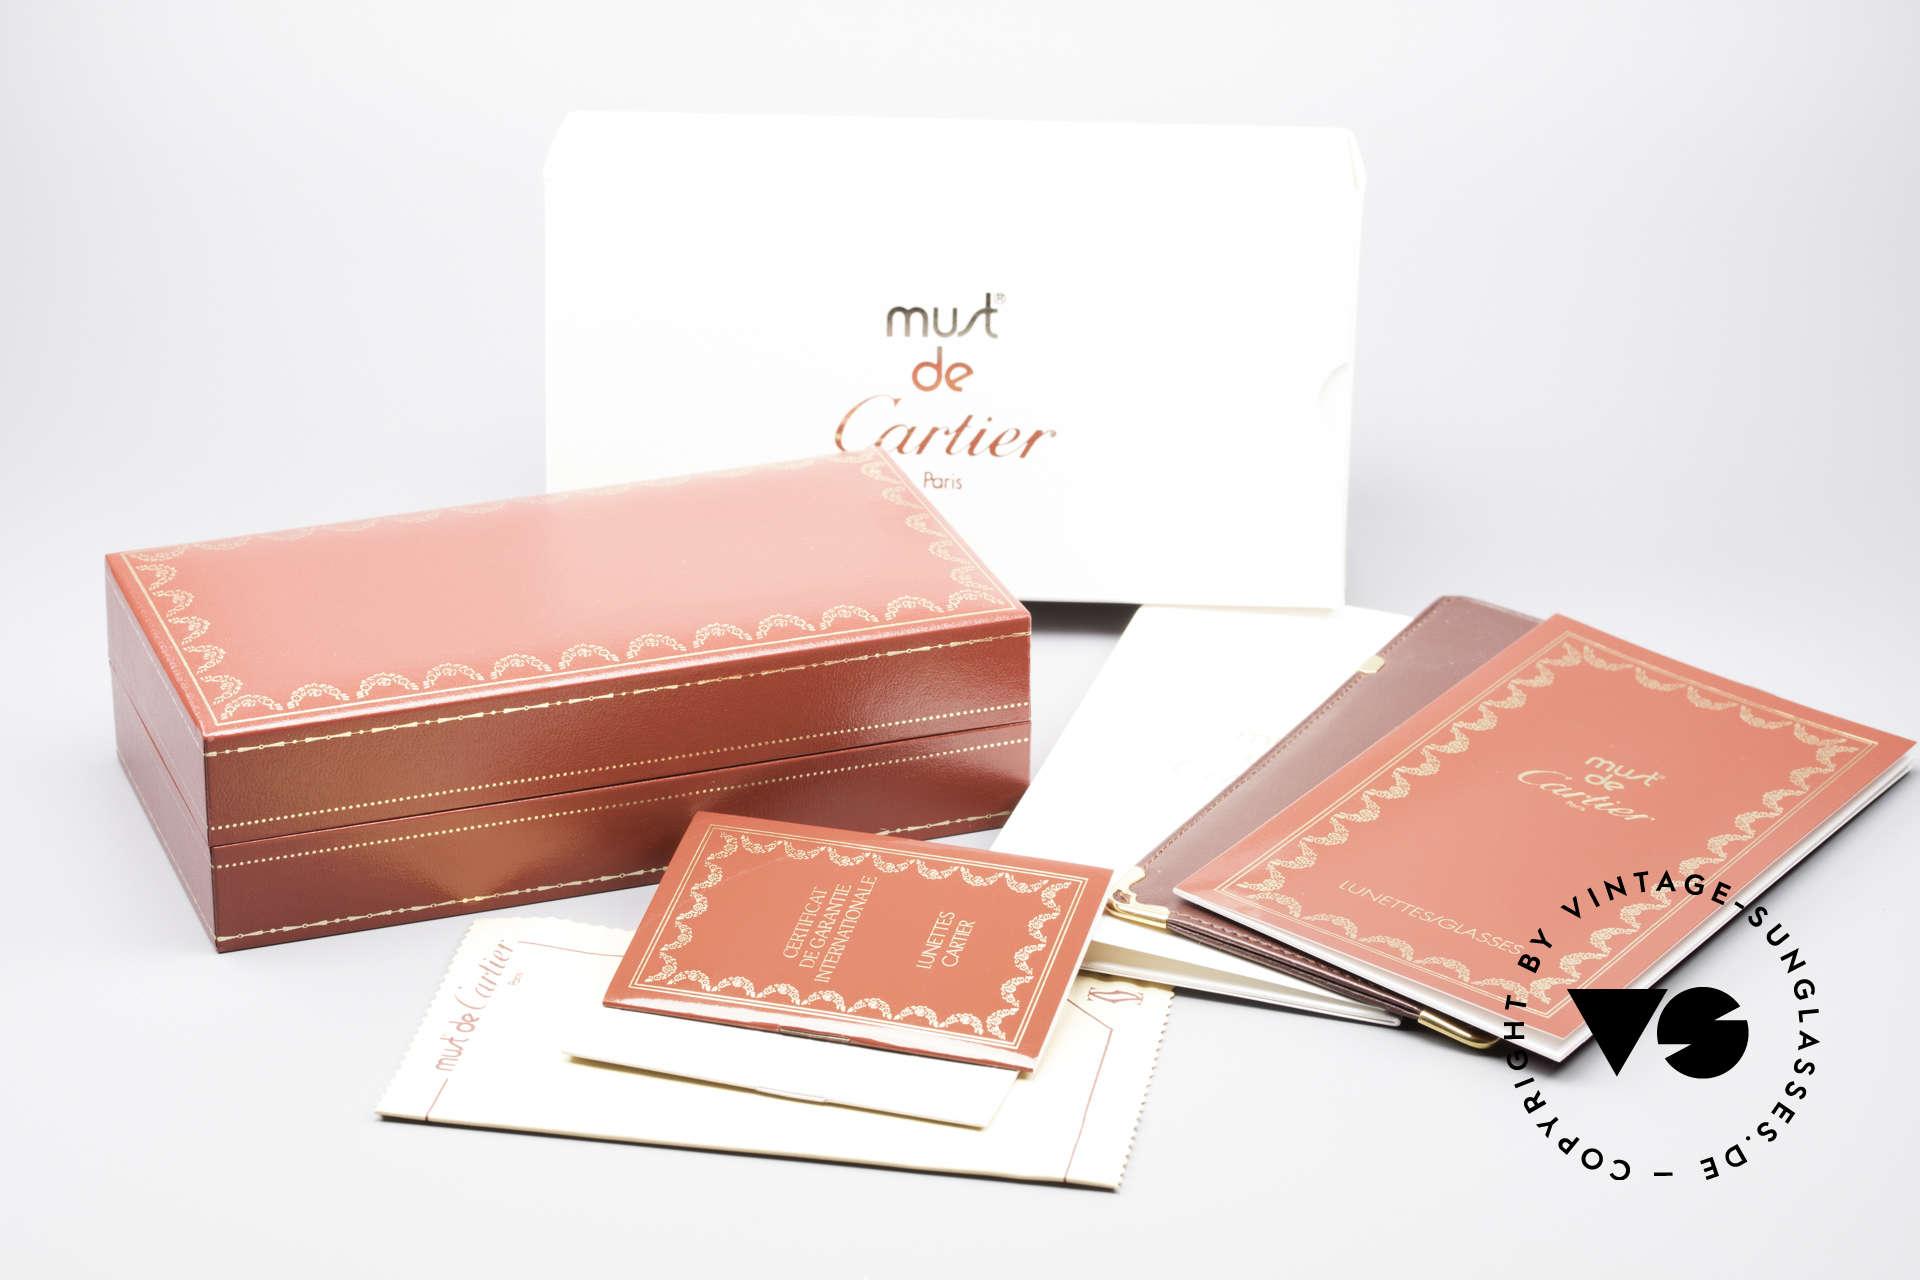 Cartier Vendome Santos - M Rare Luxury Palladium Finish, NO retro sunglasses, but an authentic vintage ORIGINAL, Made for Men